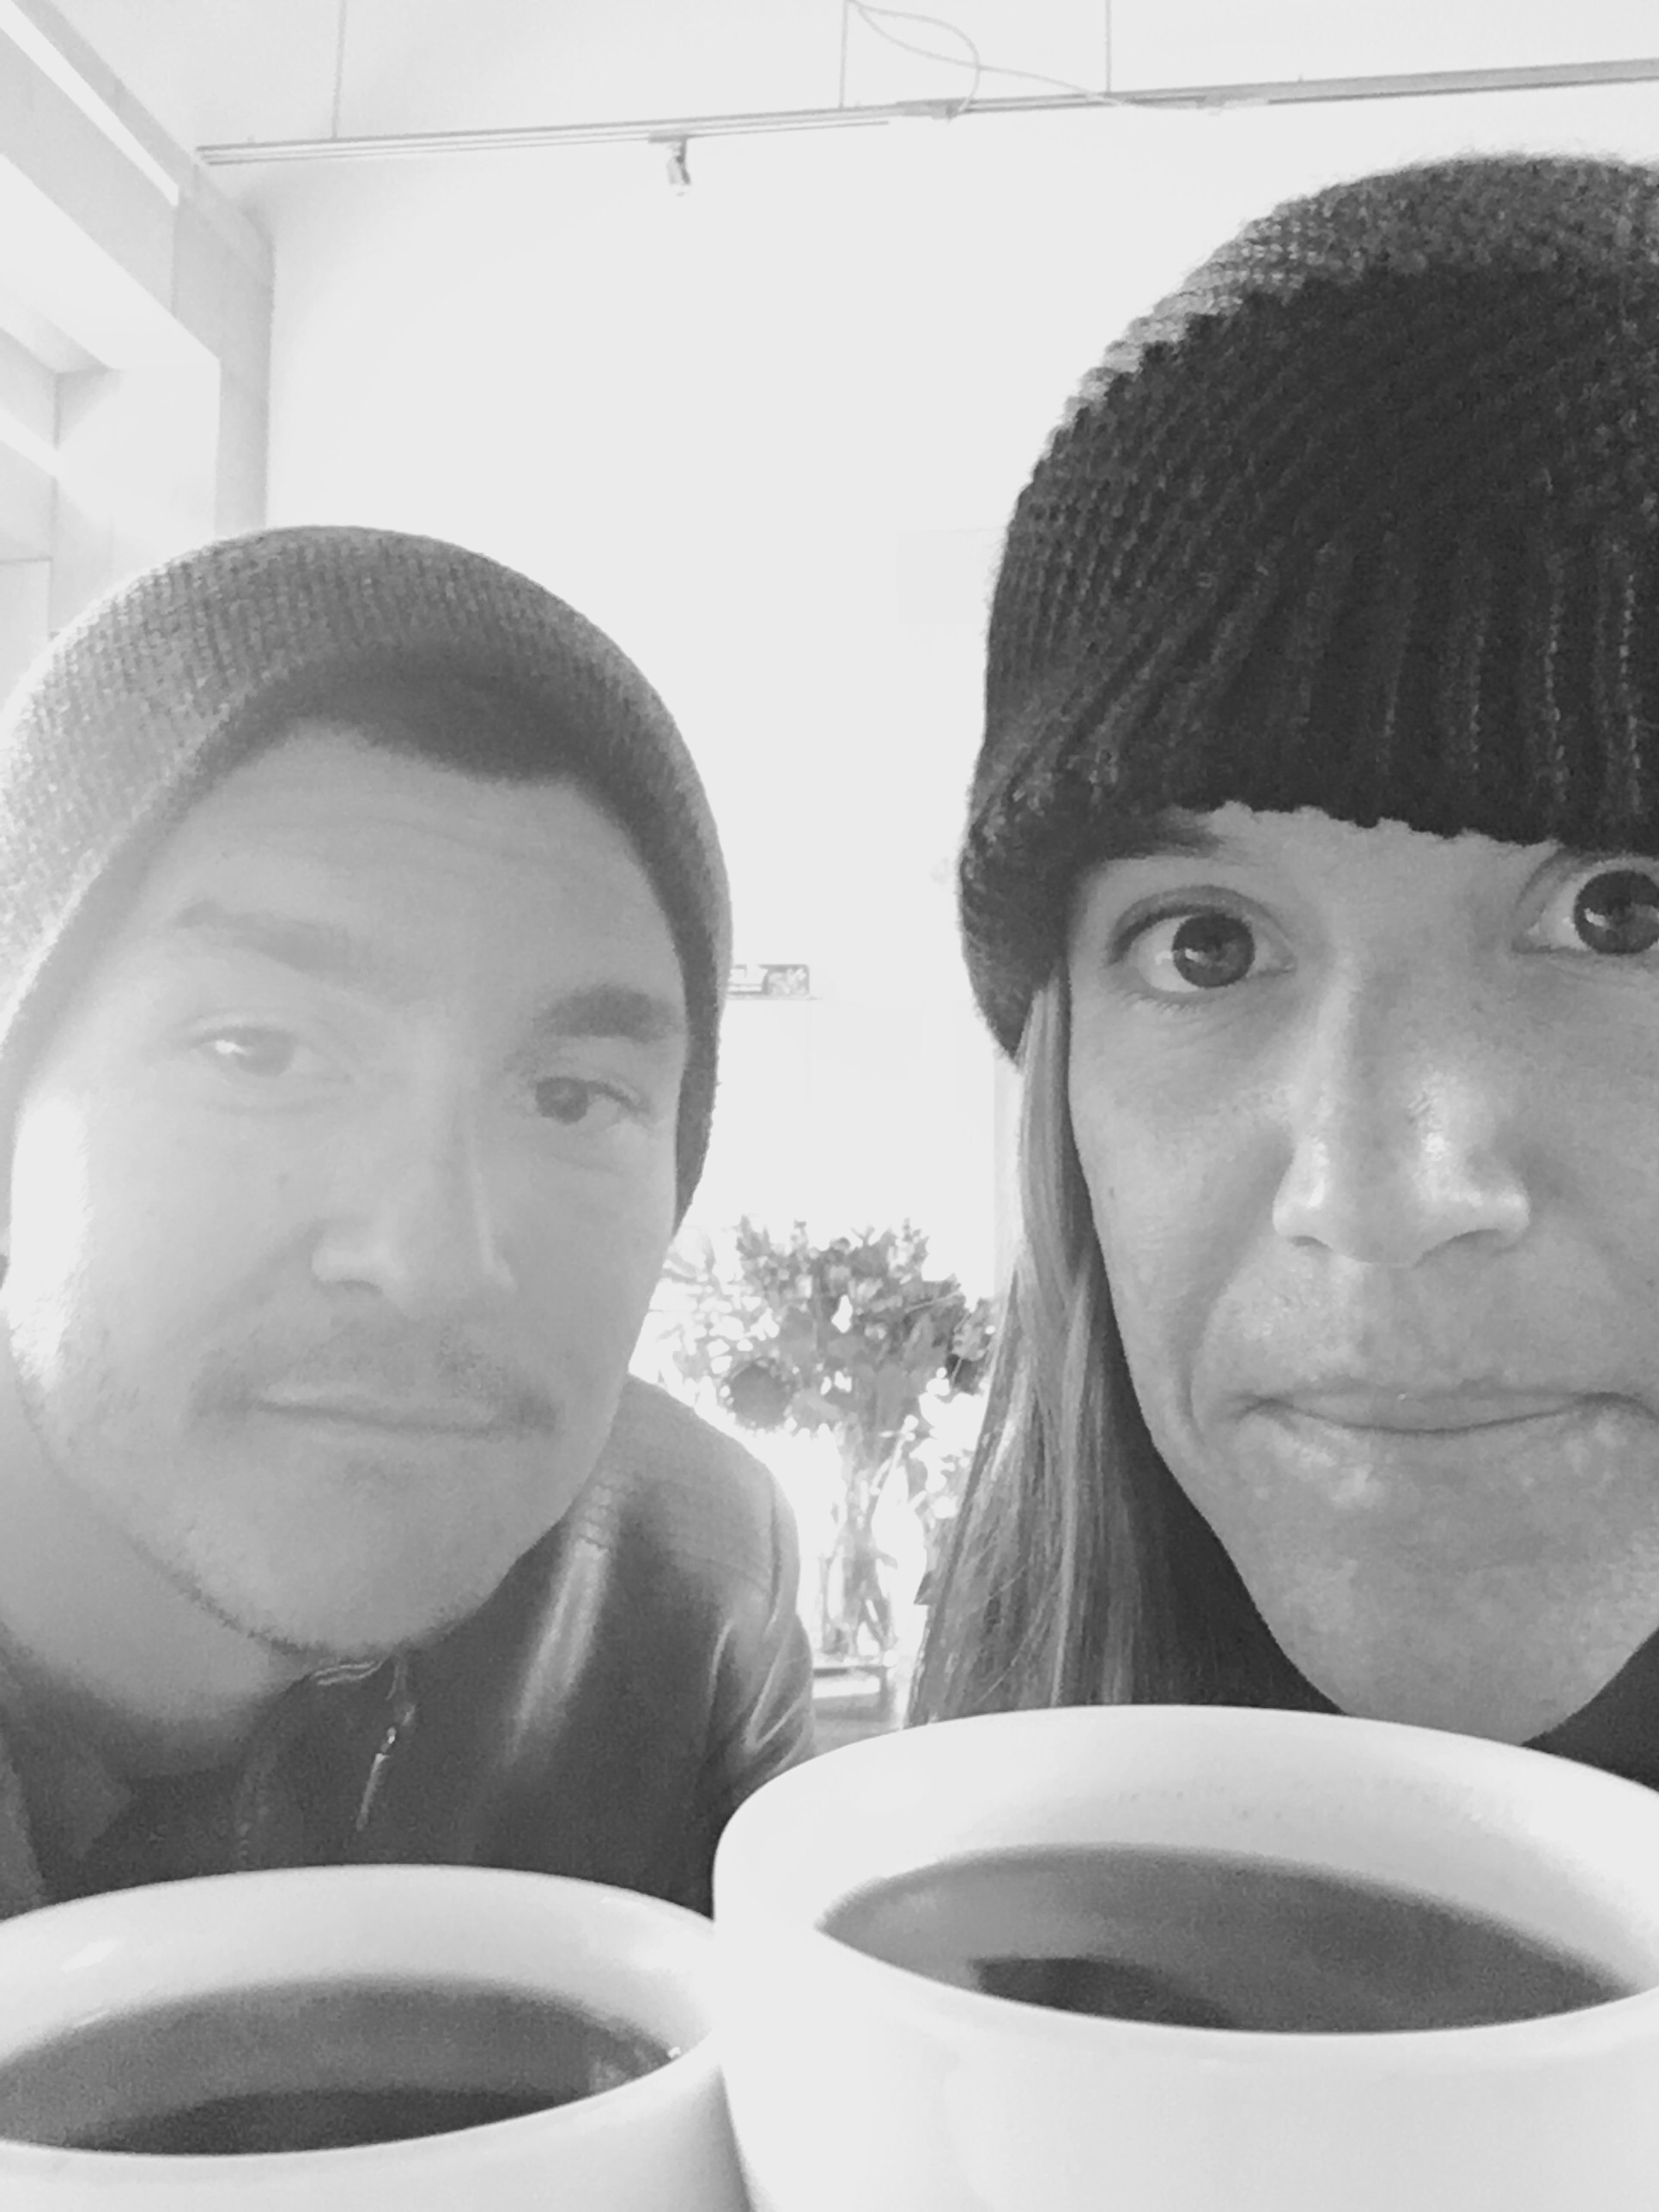 Coffee & cheers to 17 years!